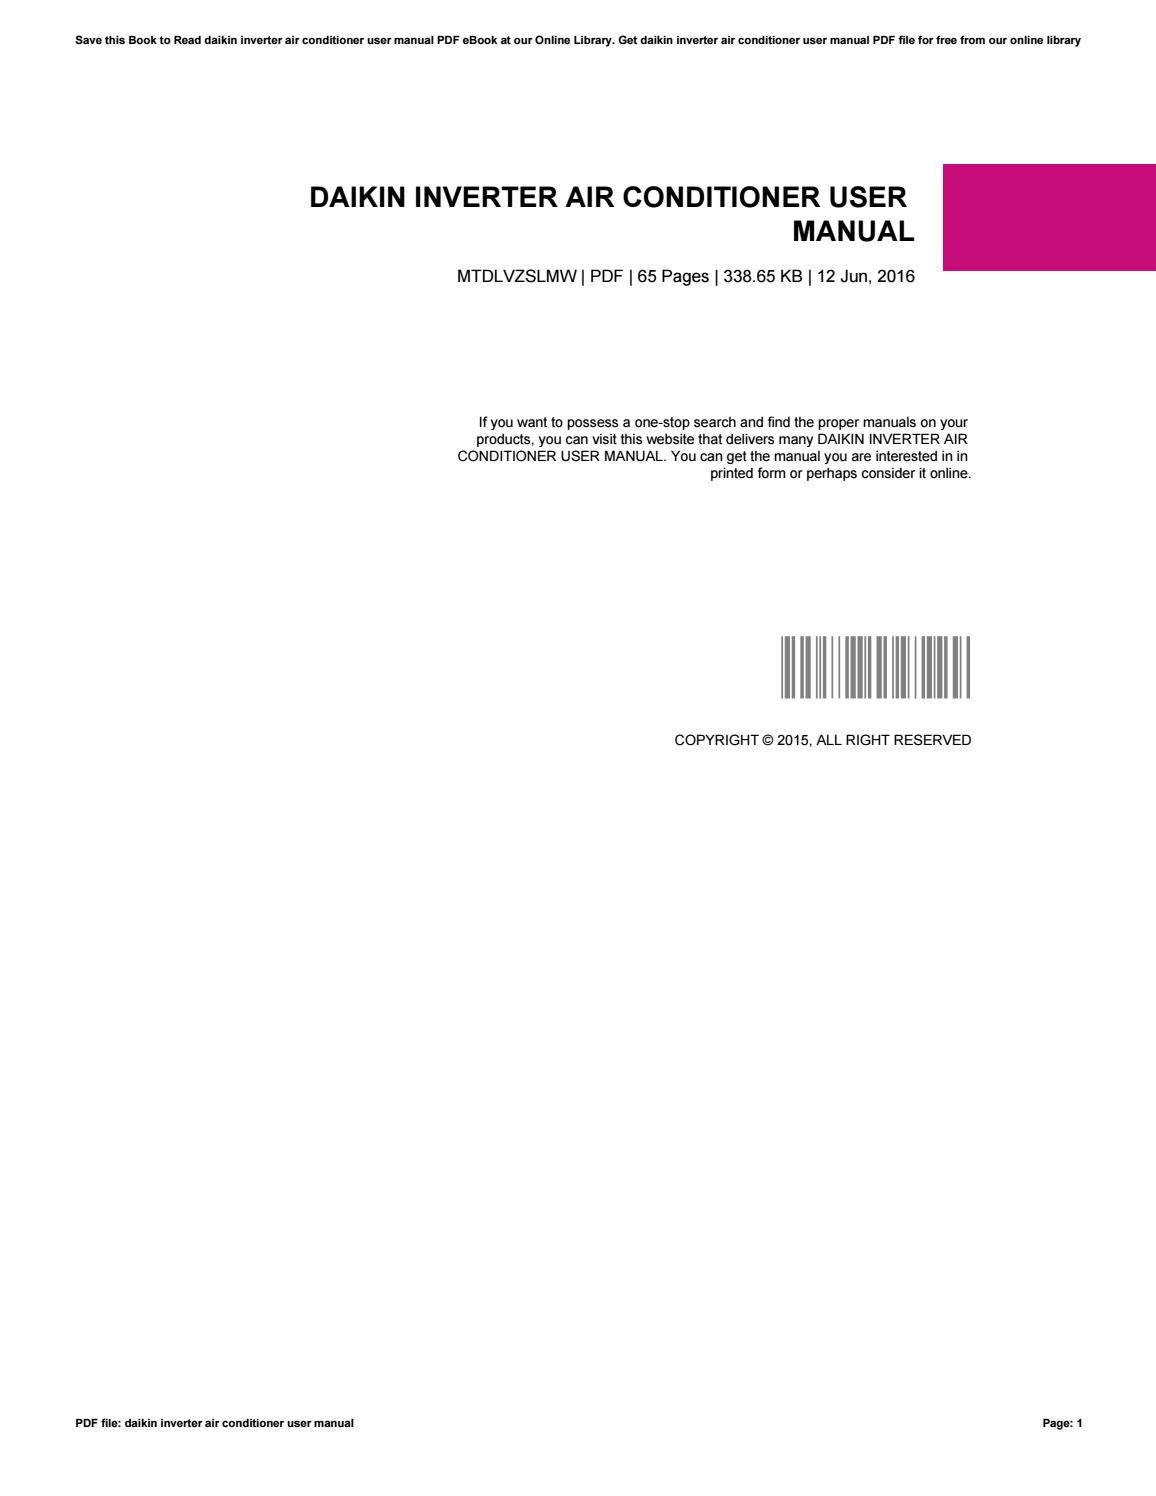 daikin inverter ftxs60fvma user manual